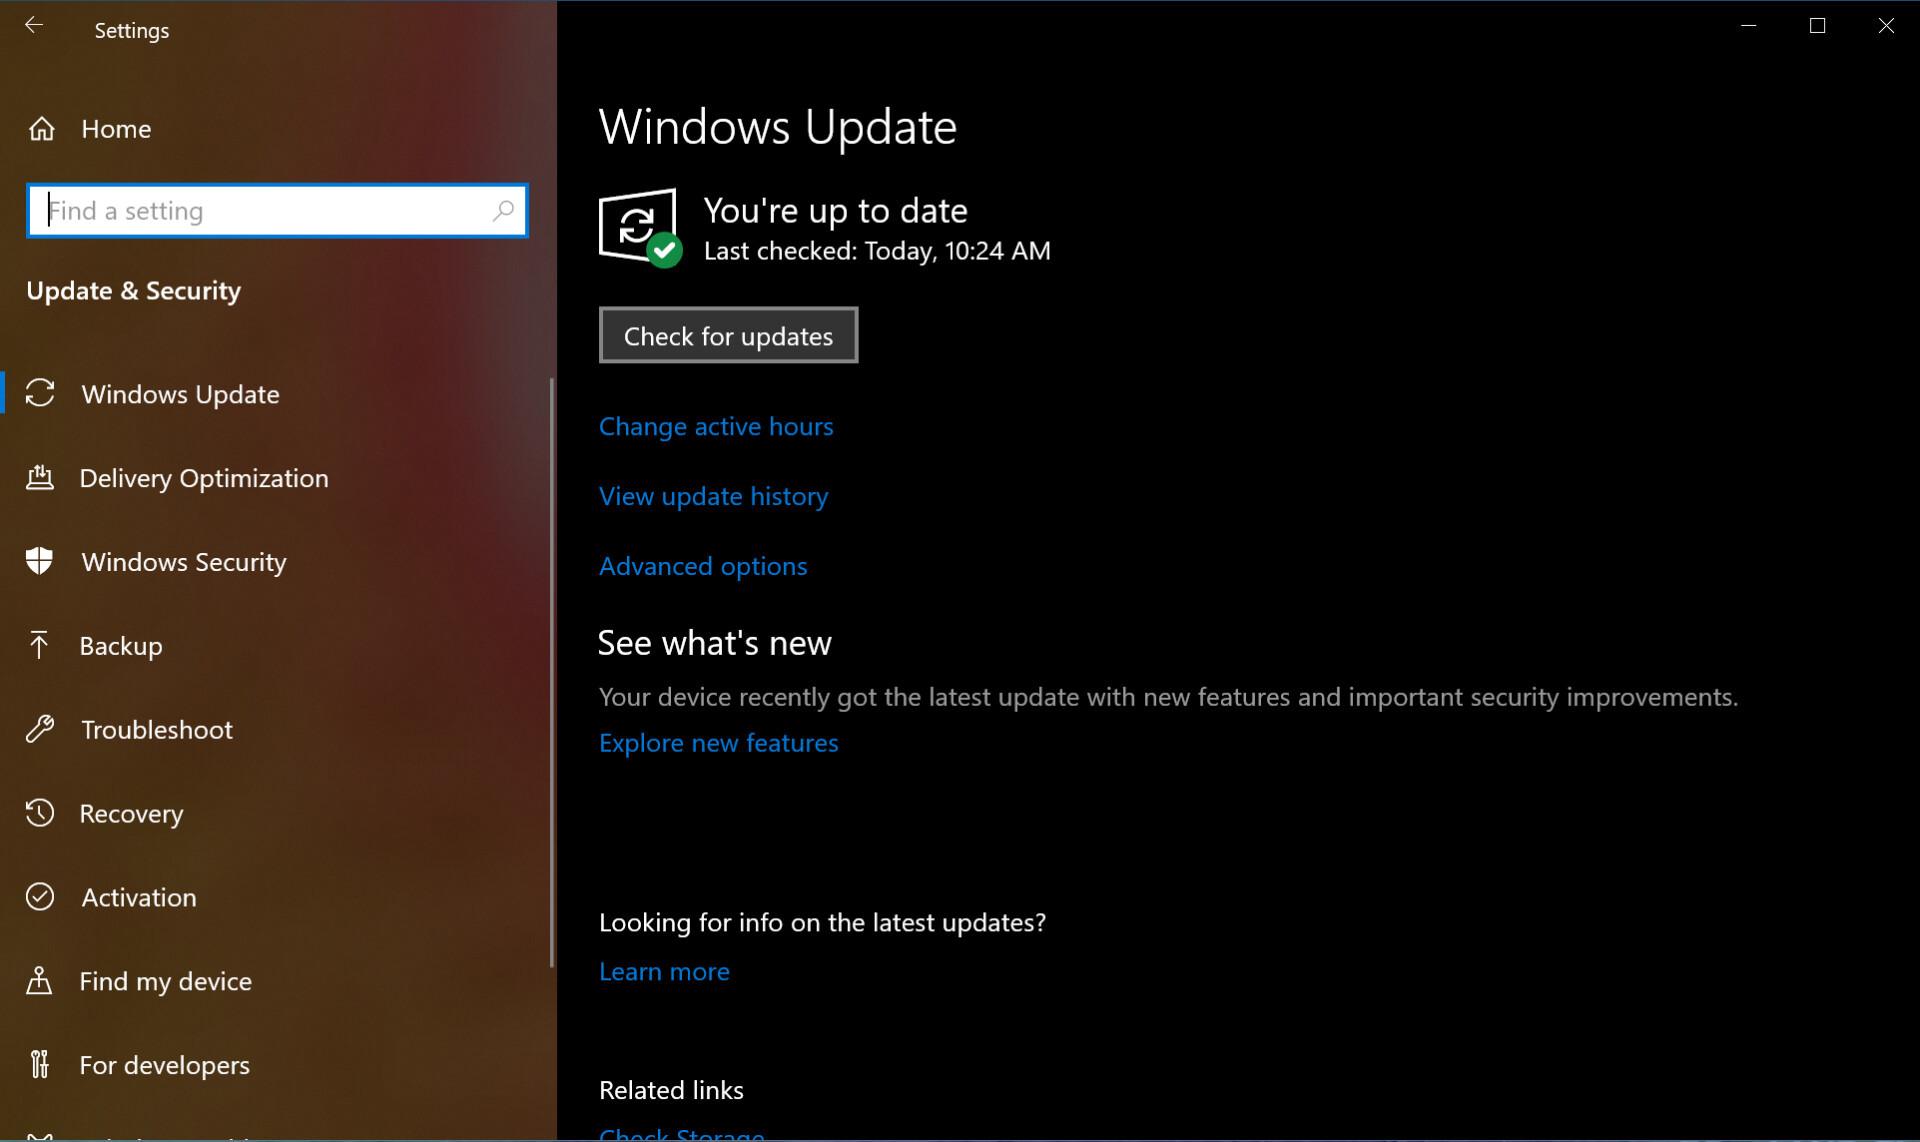 Svreenshot of Windows 10 update menu